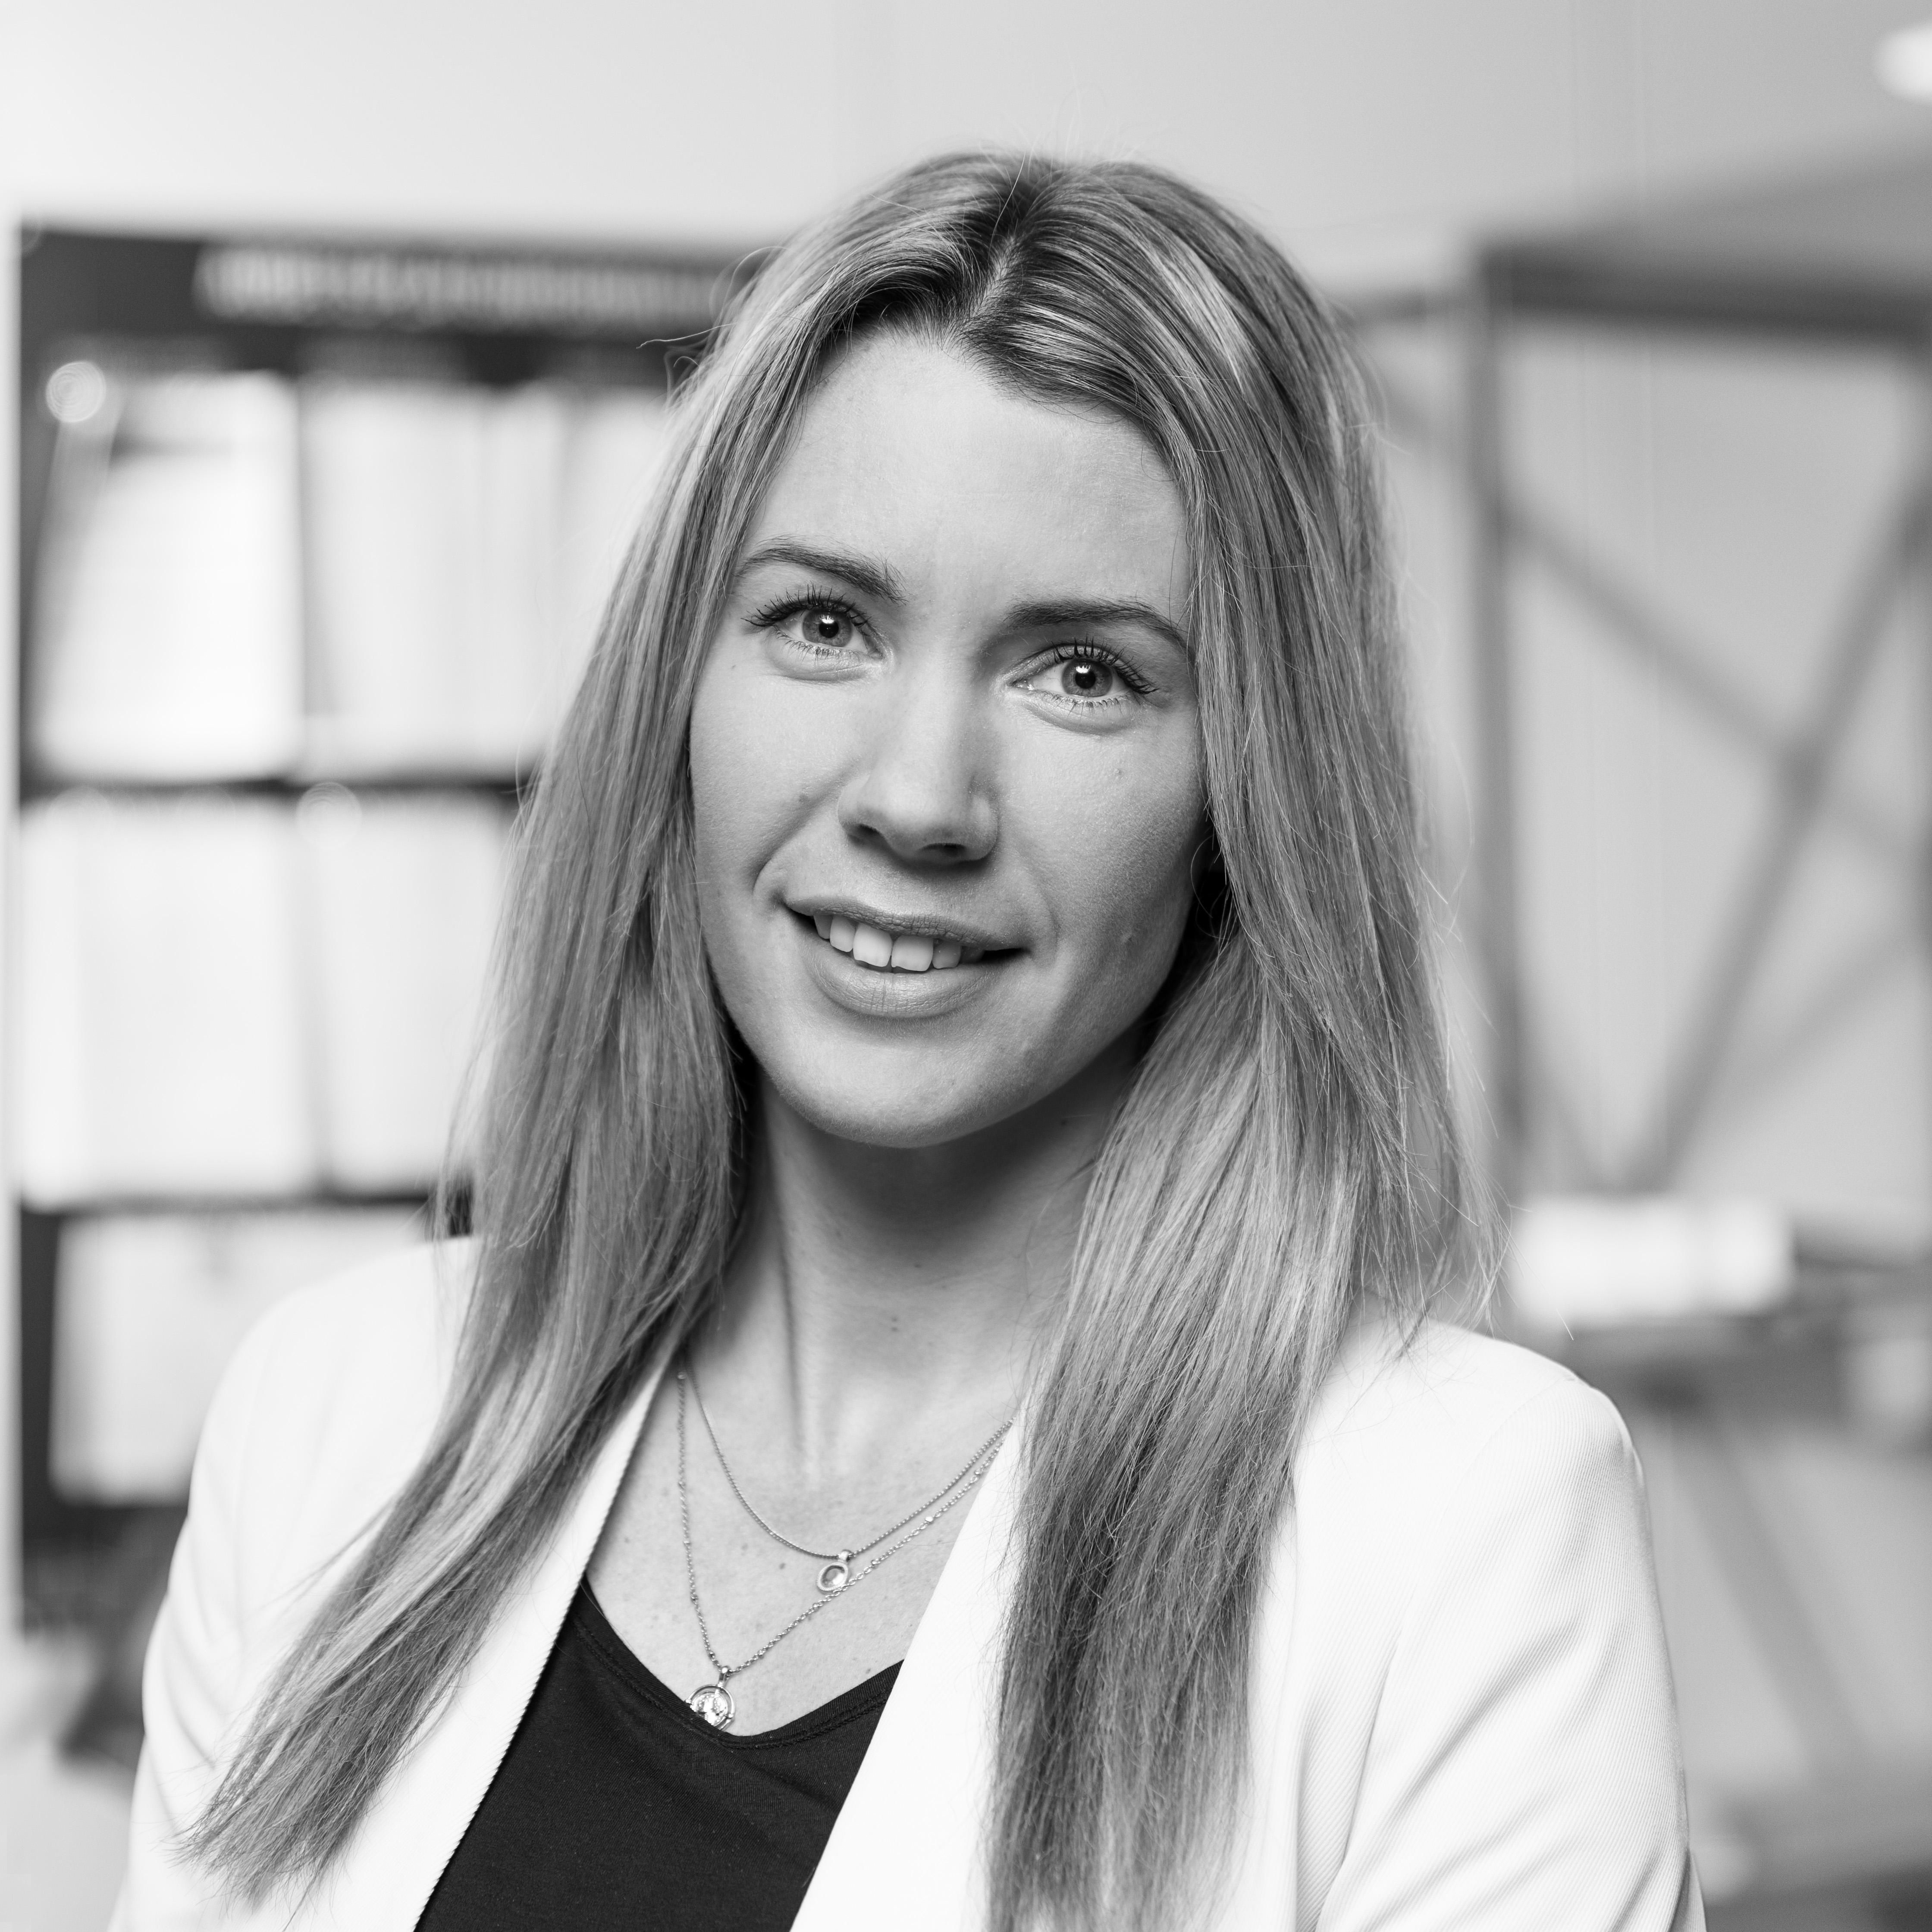 Felicia Kvarnryd